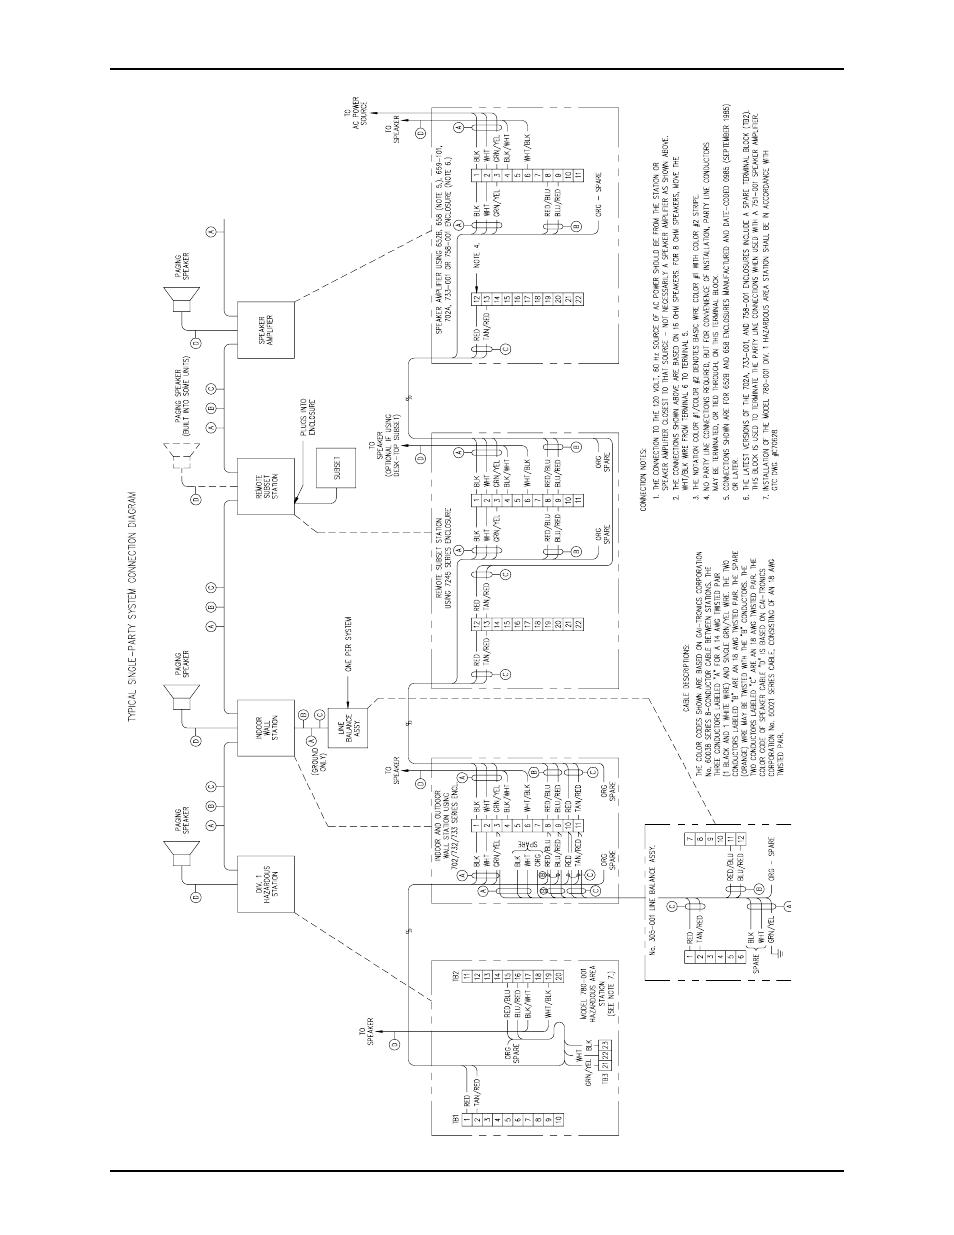 GAI-Tronics 780-001 Explosion-proof Handset Stations User